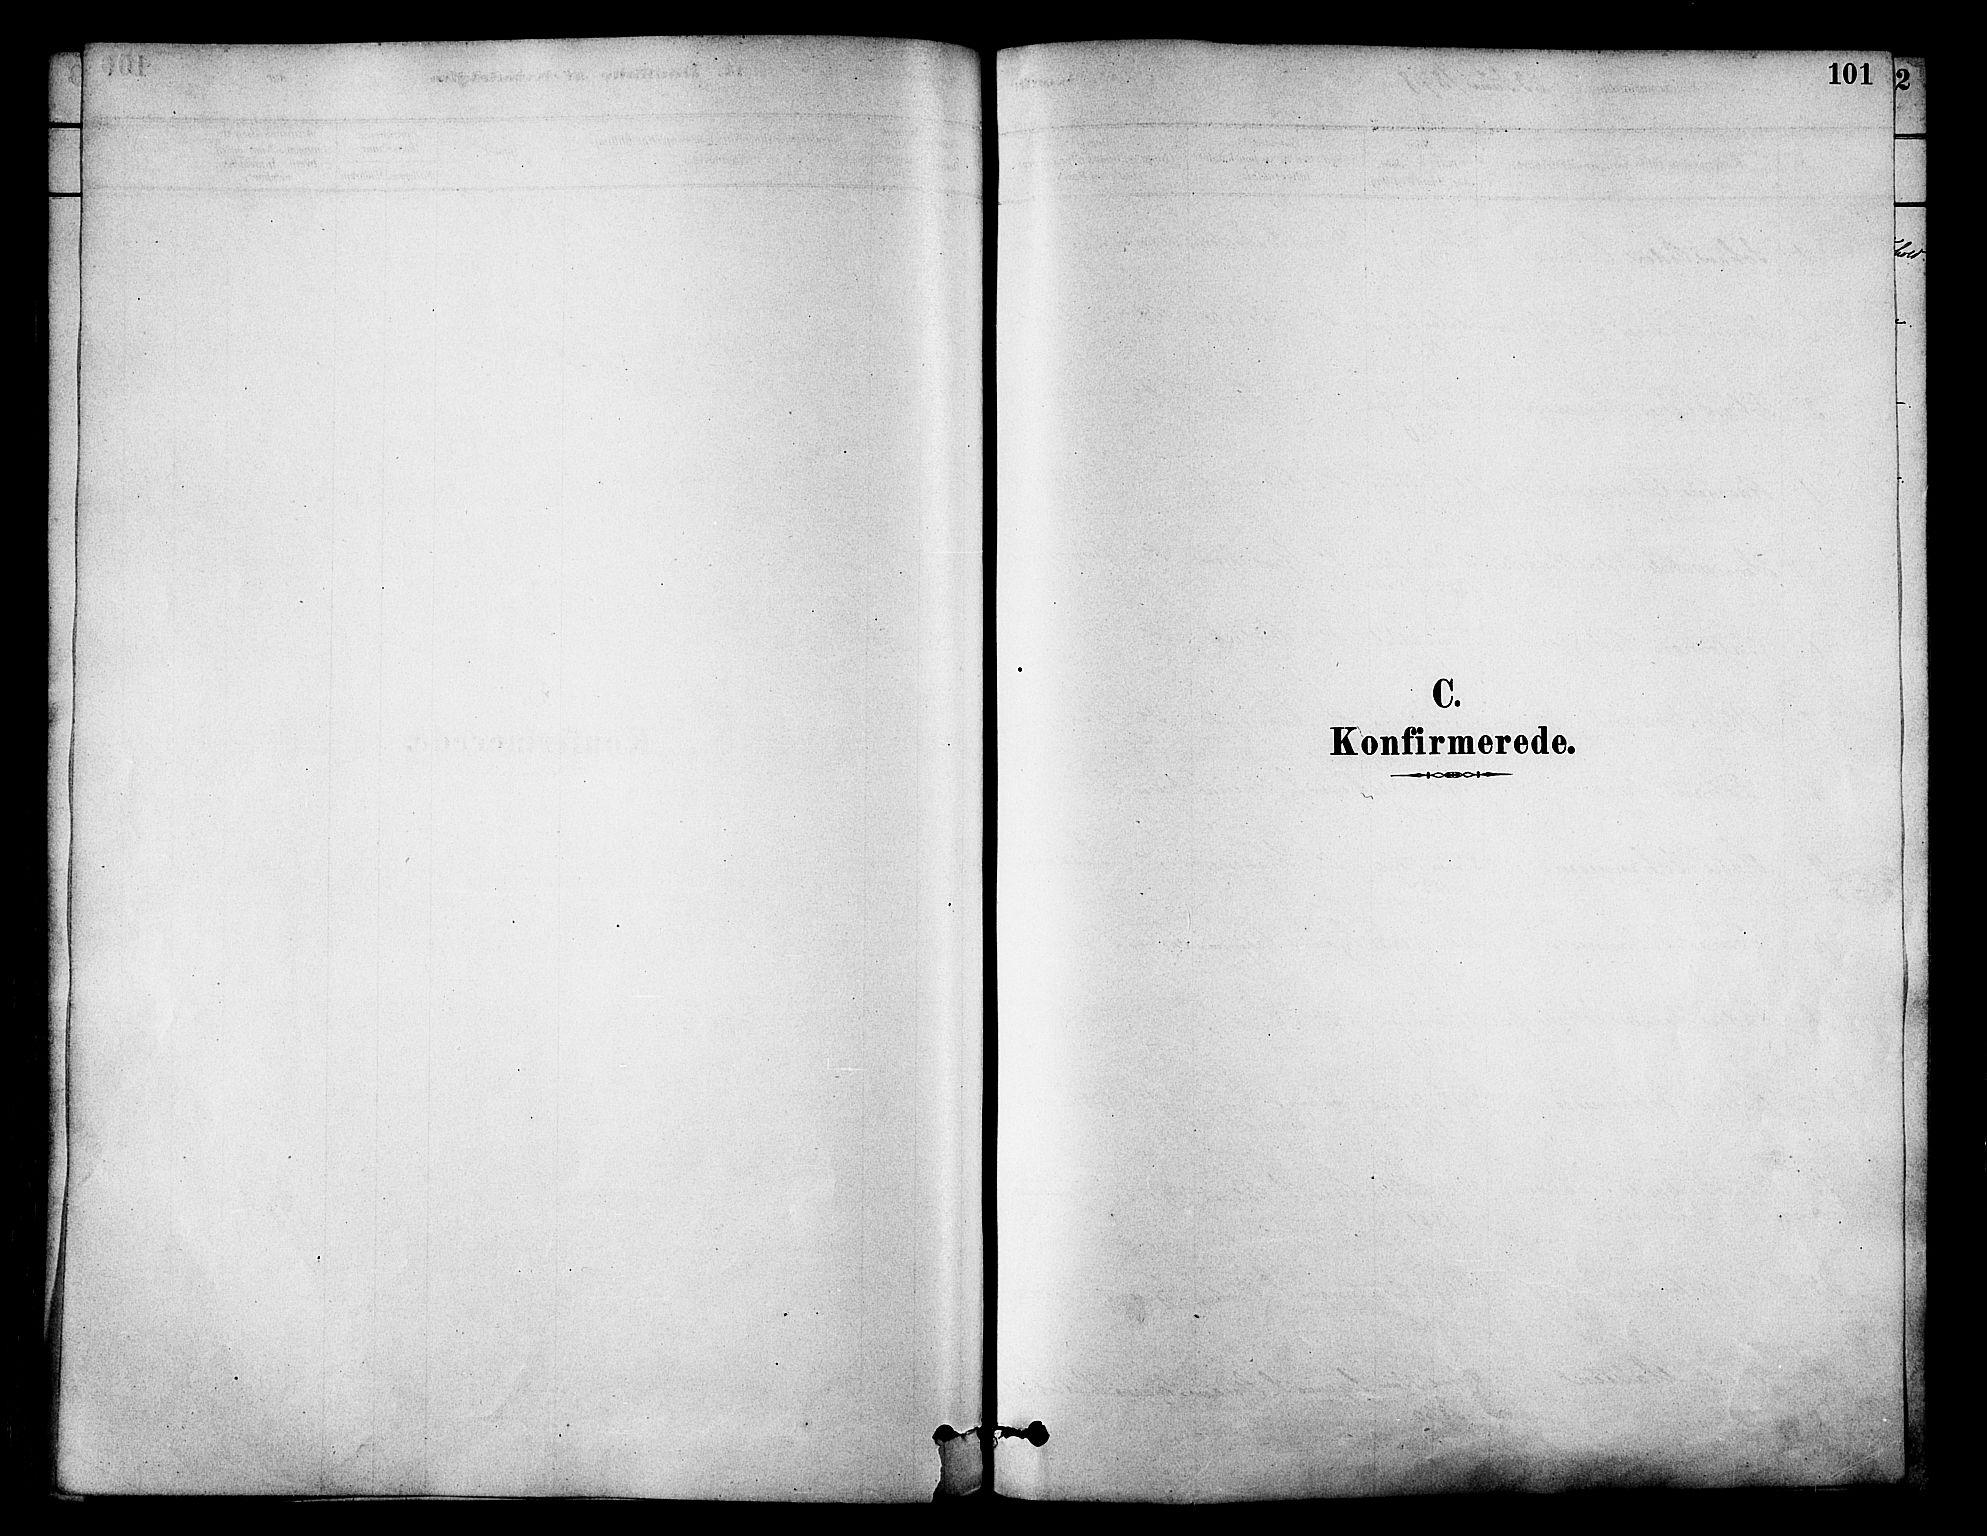 SATØ, Skjervøy sokneprestkontor, H/Ha/Haa/L0009kirke: Ministerialbok nr. 9, 1878-1887, s. 101